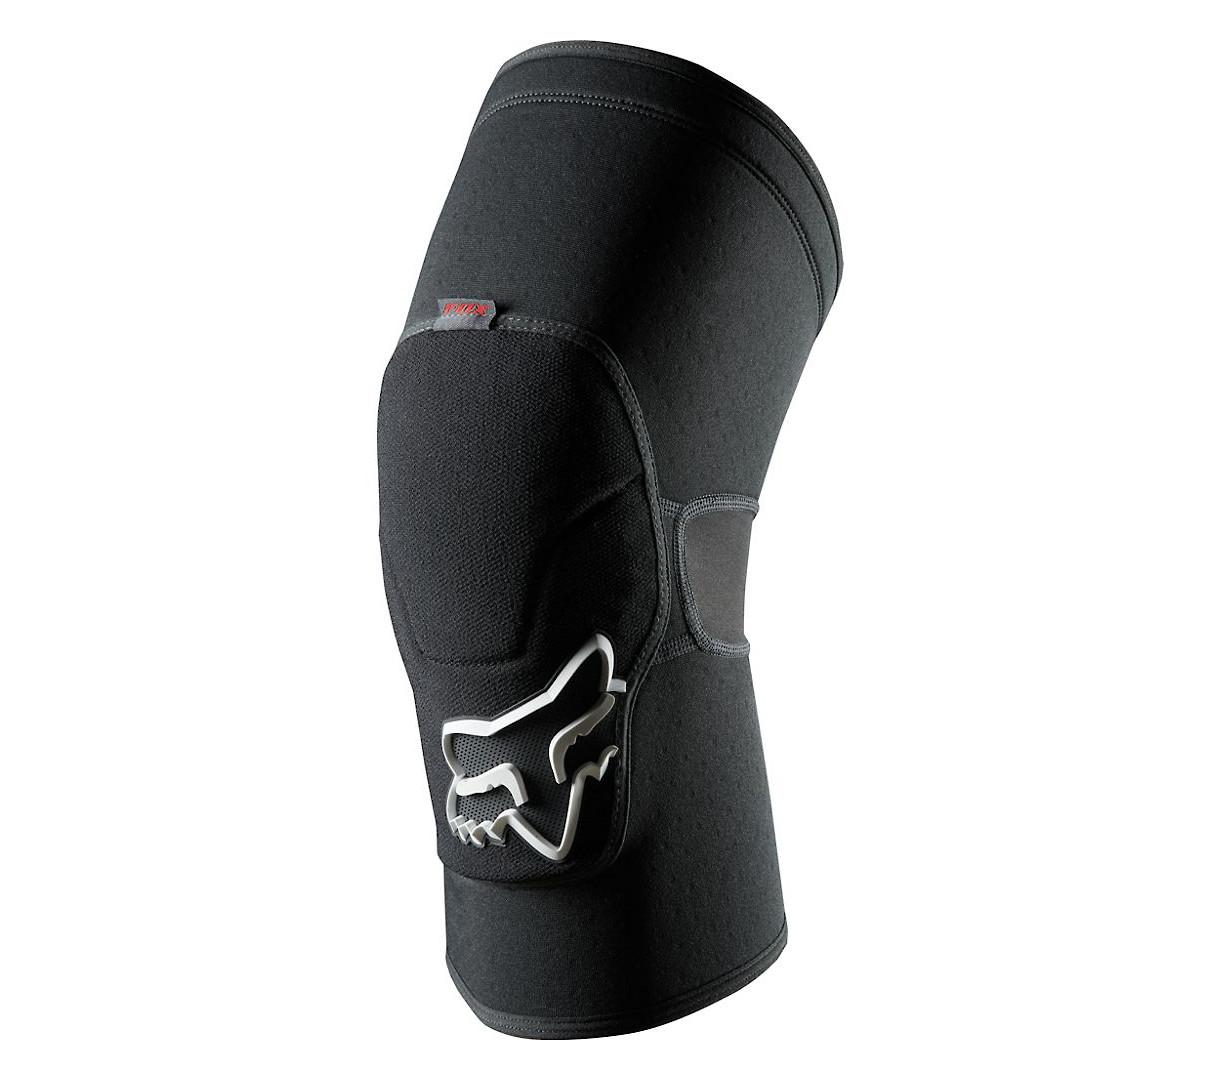 Fox Racing Launch Enduro Knee Pad (grey)